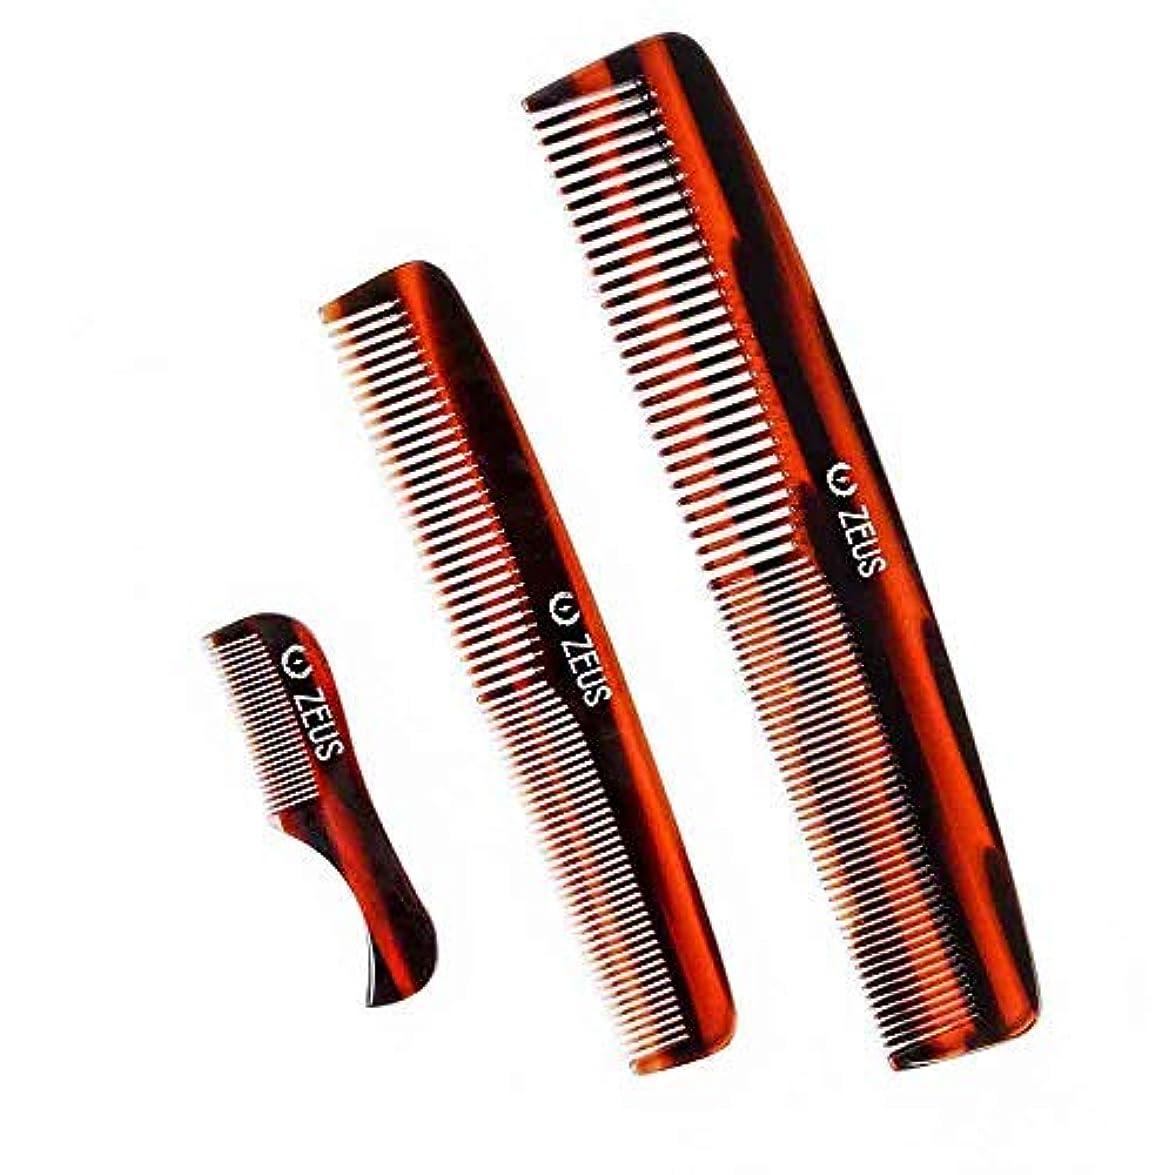 ZEUS Mustache, Beard, and Hair Comb Set- Handmade Anti-Static Acetate (Traditional) [並行輸入品]